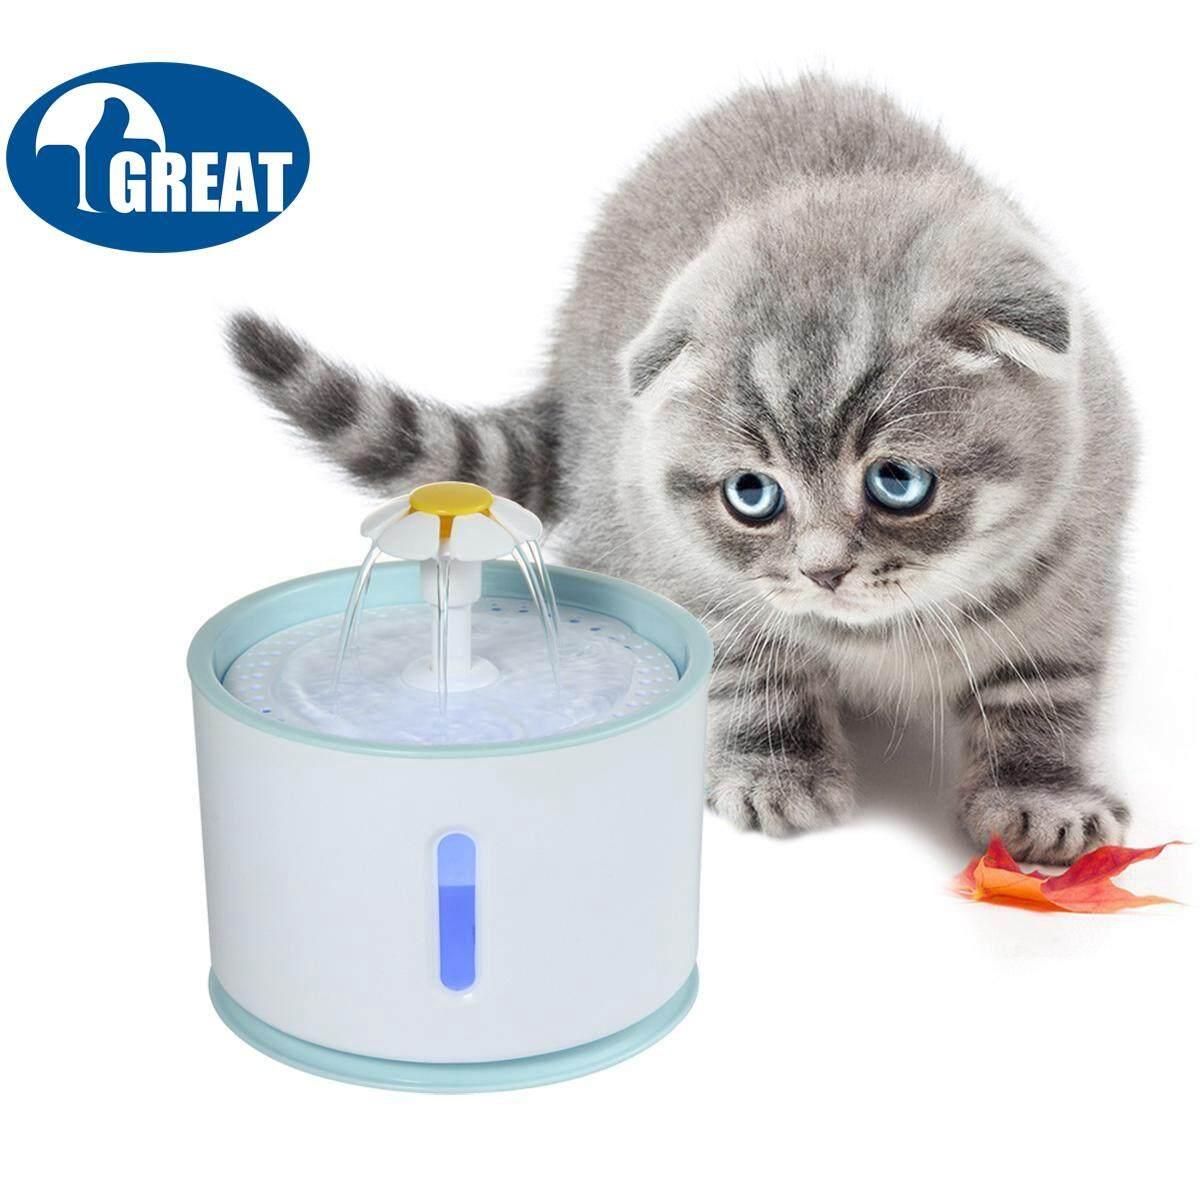 Goodgreat อัพเกรด 2.4l Led Cat น้ำพุพร้อมตัวกรองถ่าน, ส่องสว่างอัตโนมัติที่ให้อาหารสัตว์น้ำ - เงียบมากและ Hygienic แมวน้ำพุดอกไม้สำหรับสุนัขและแมว By Good&great.